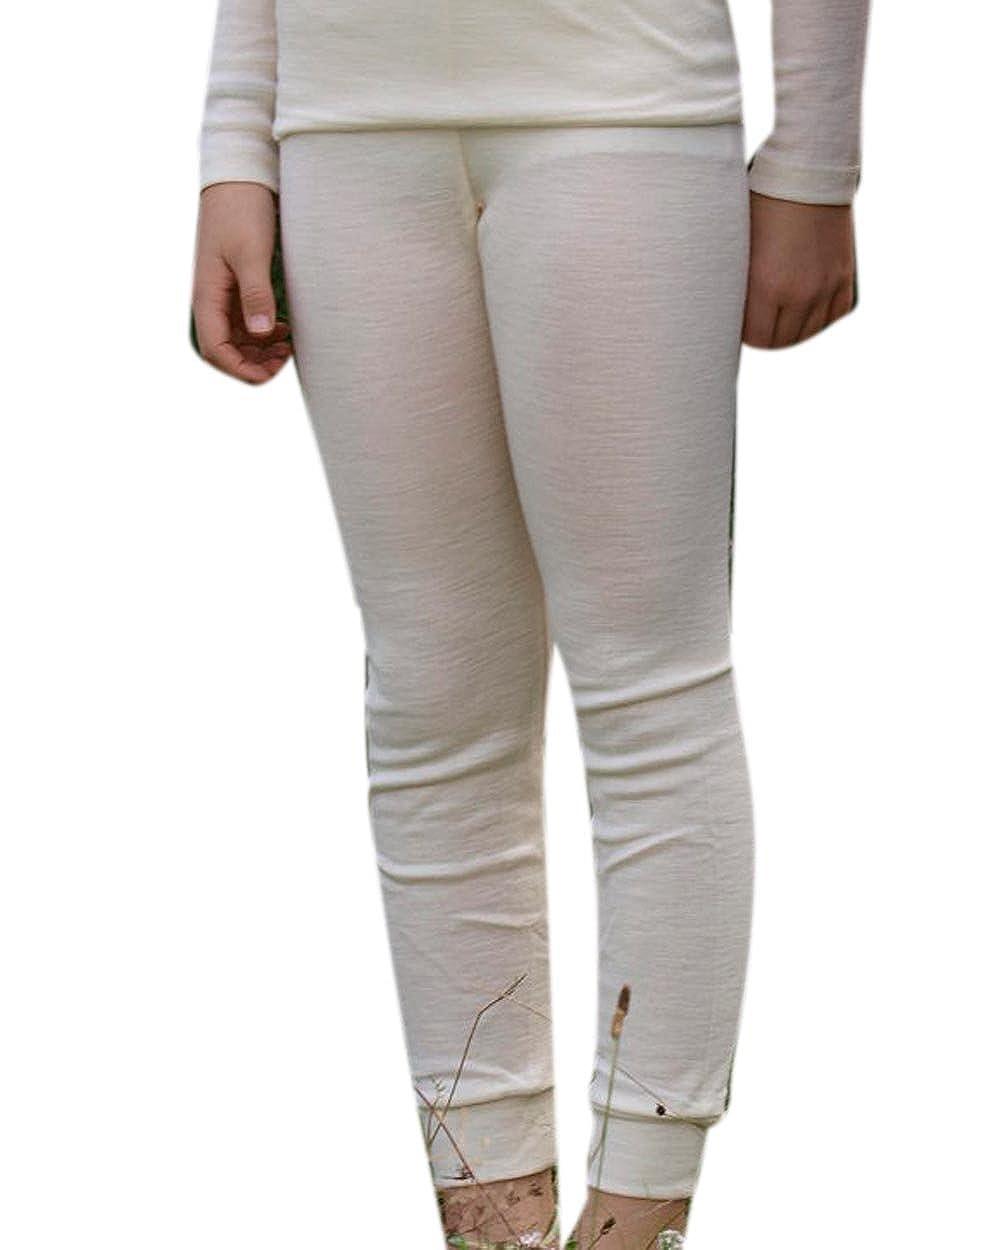 Engel Childrens 100/% Organic Merino Wool Long Johns